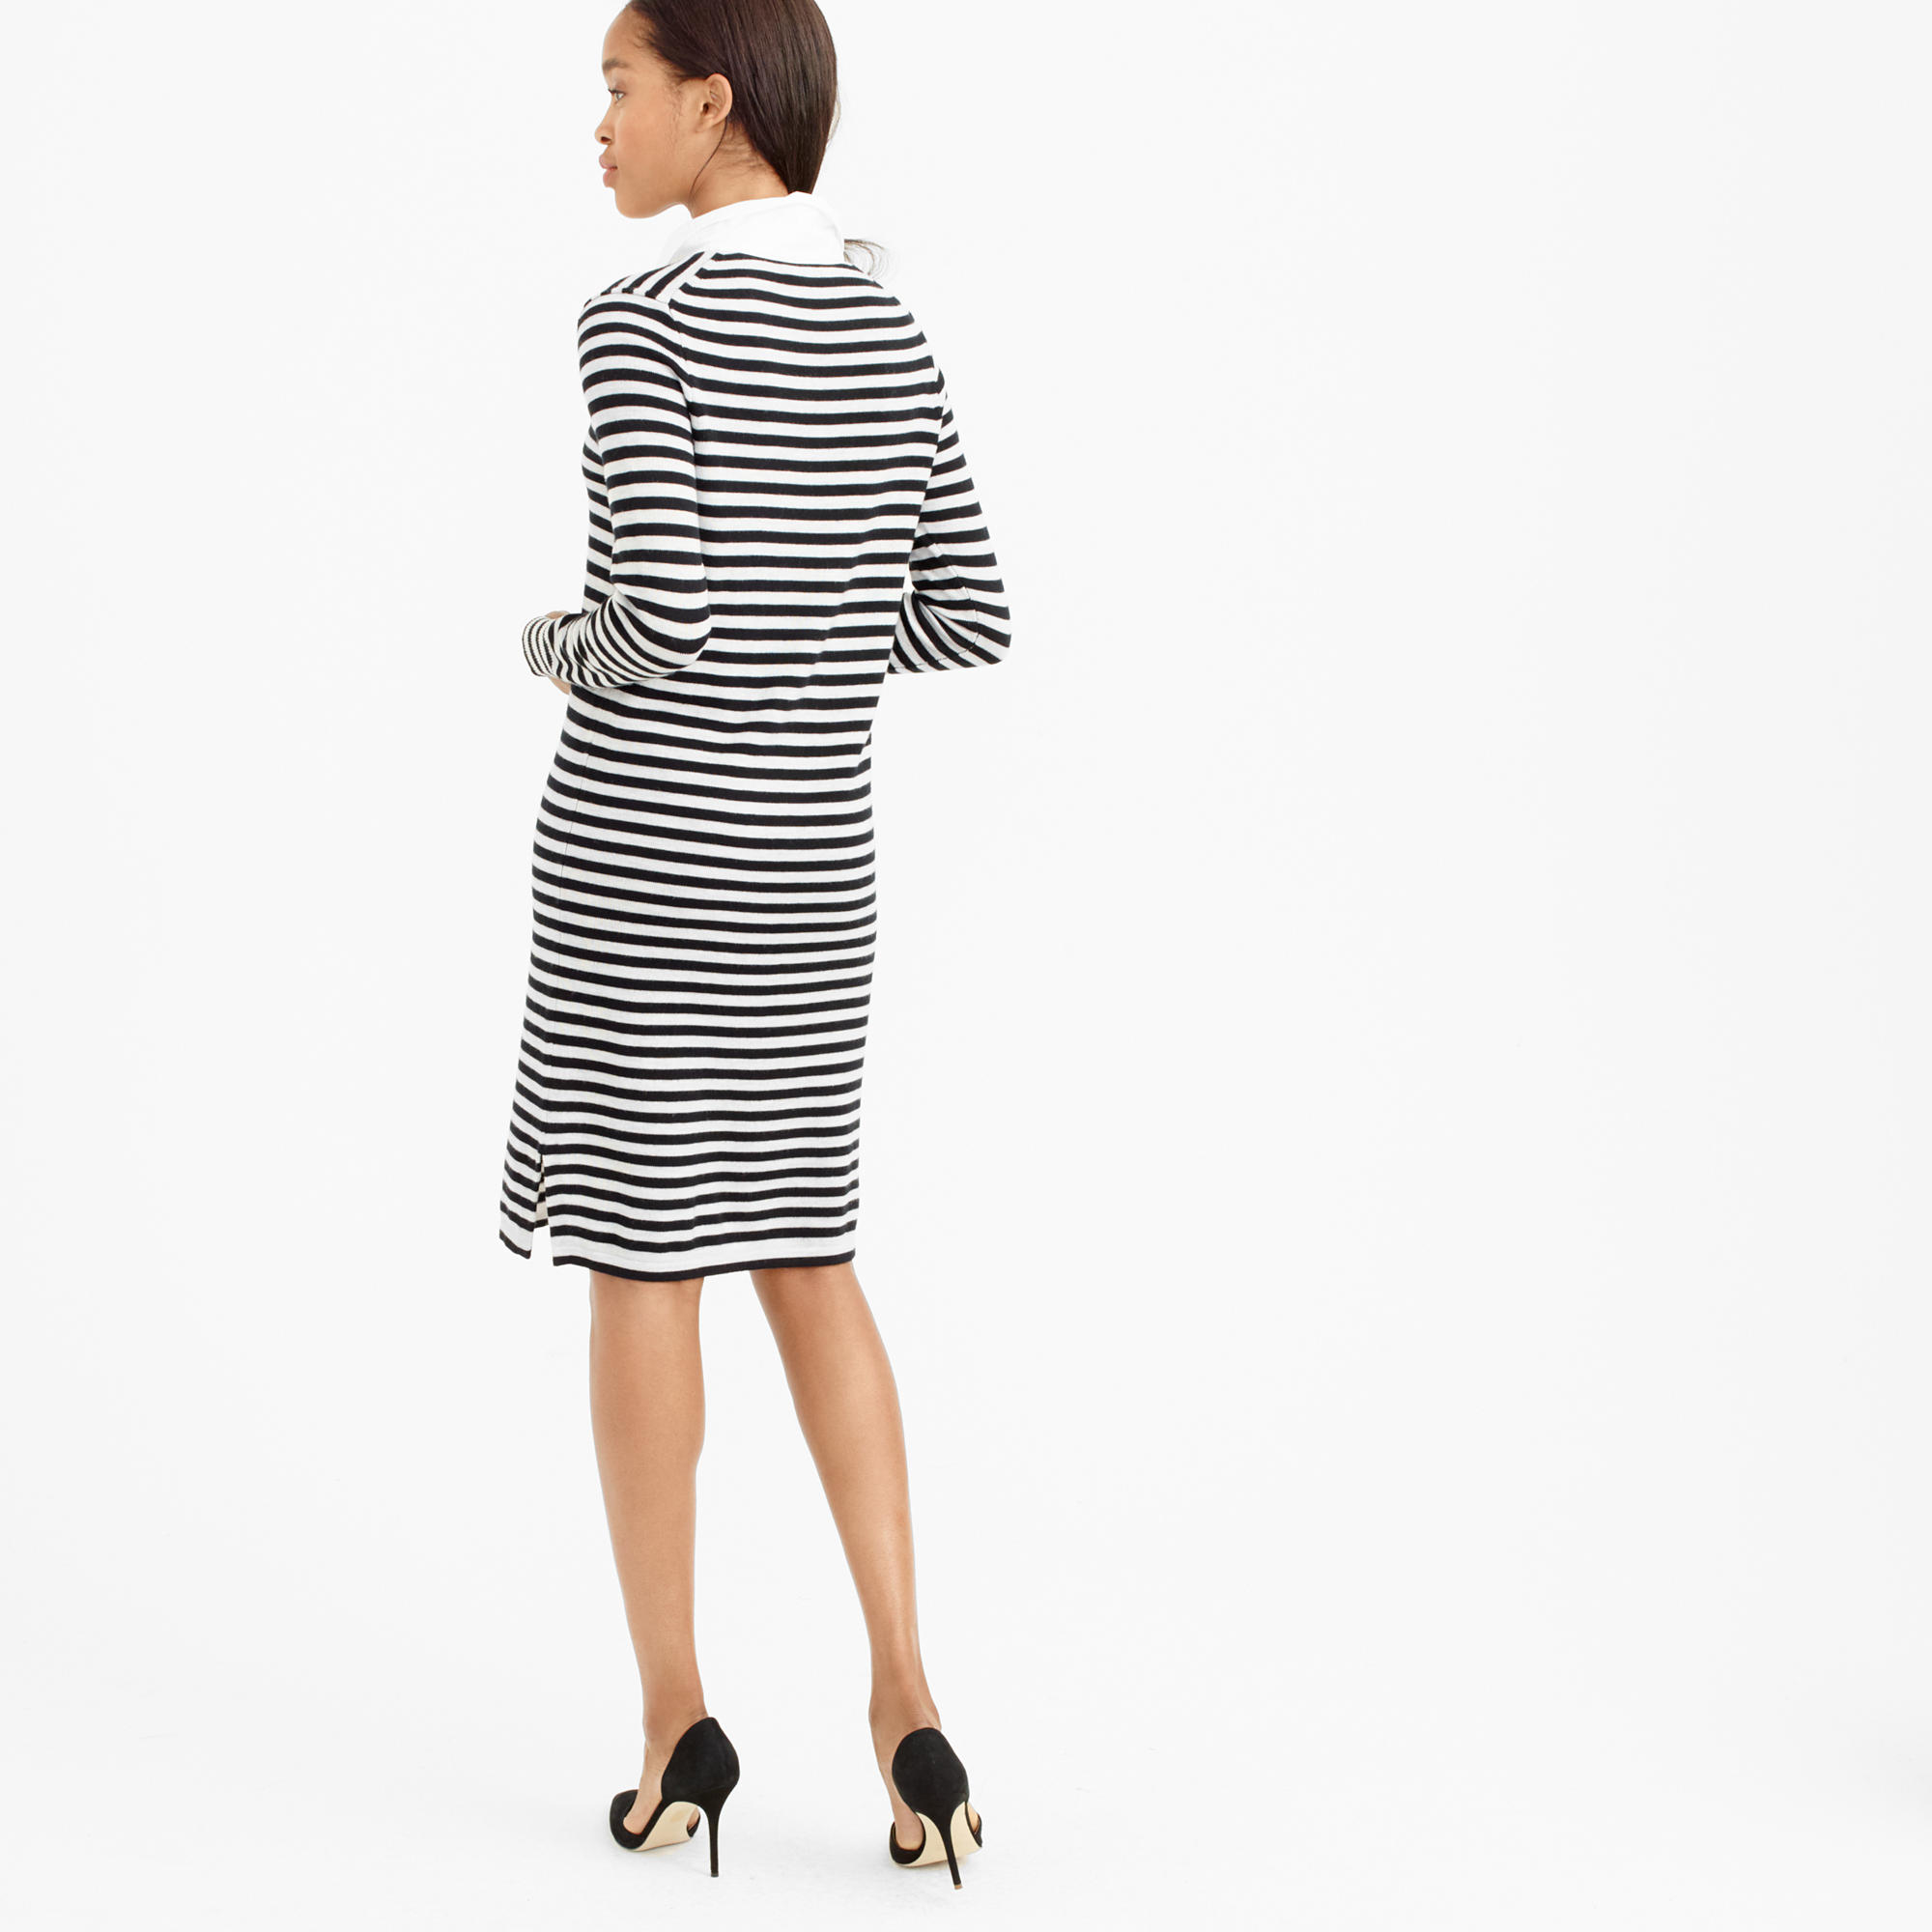 Striped Dress crew Black In Wool Lyst J Polo Merino Sweater vbf76yYgI